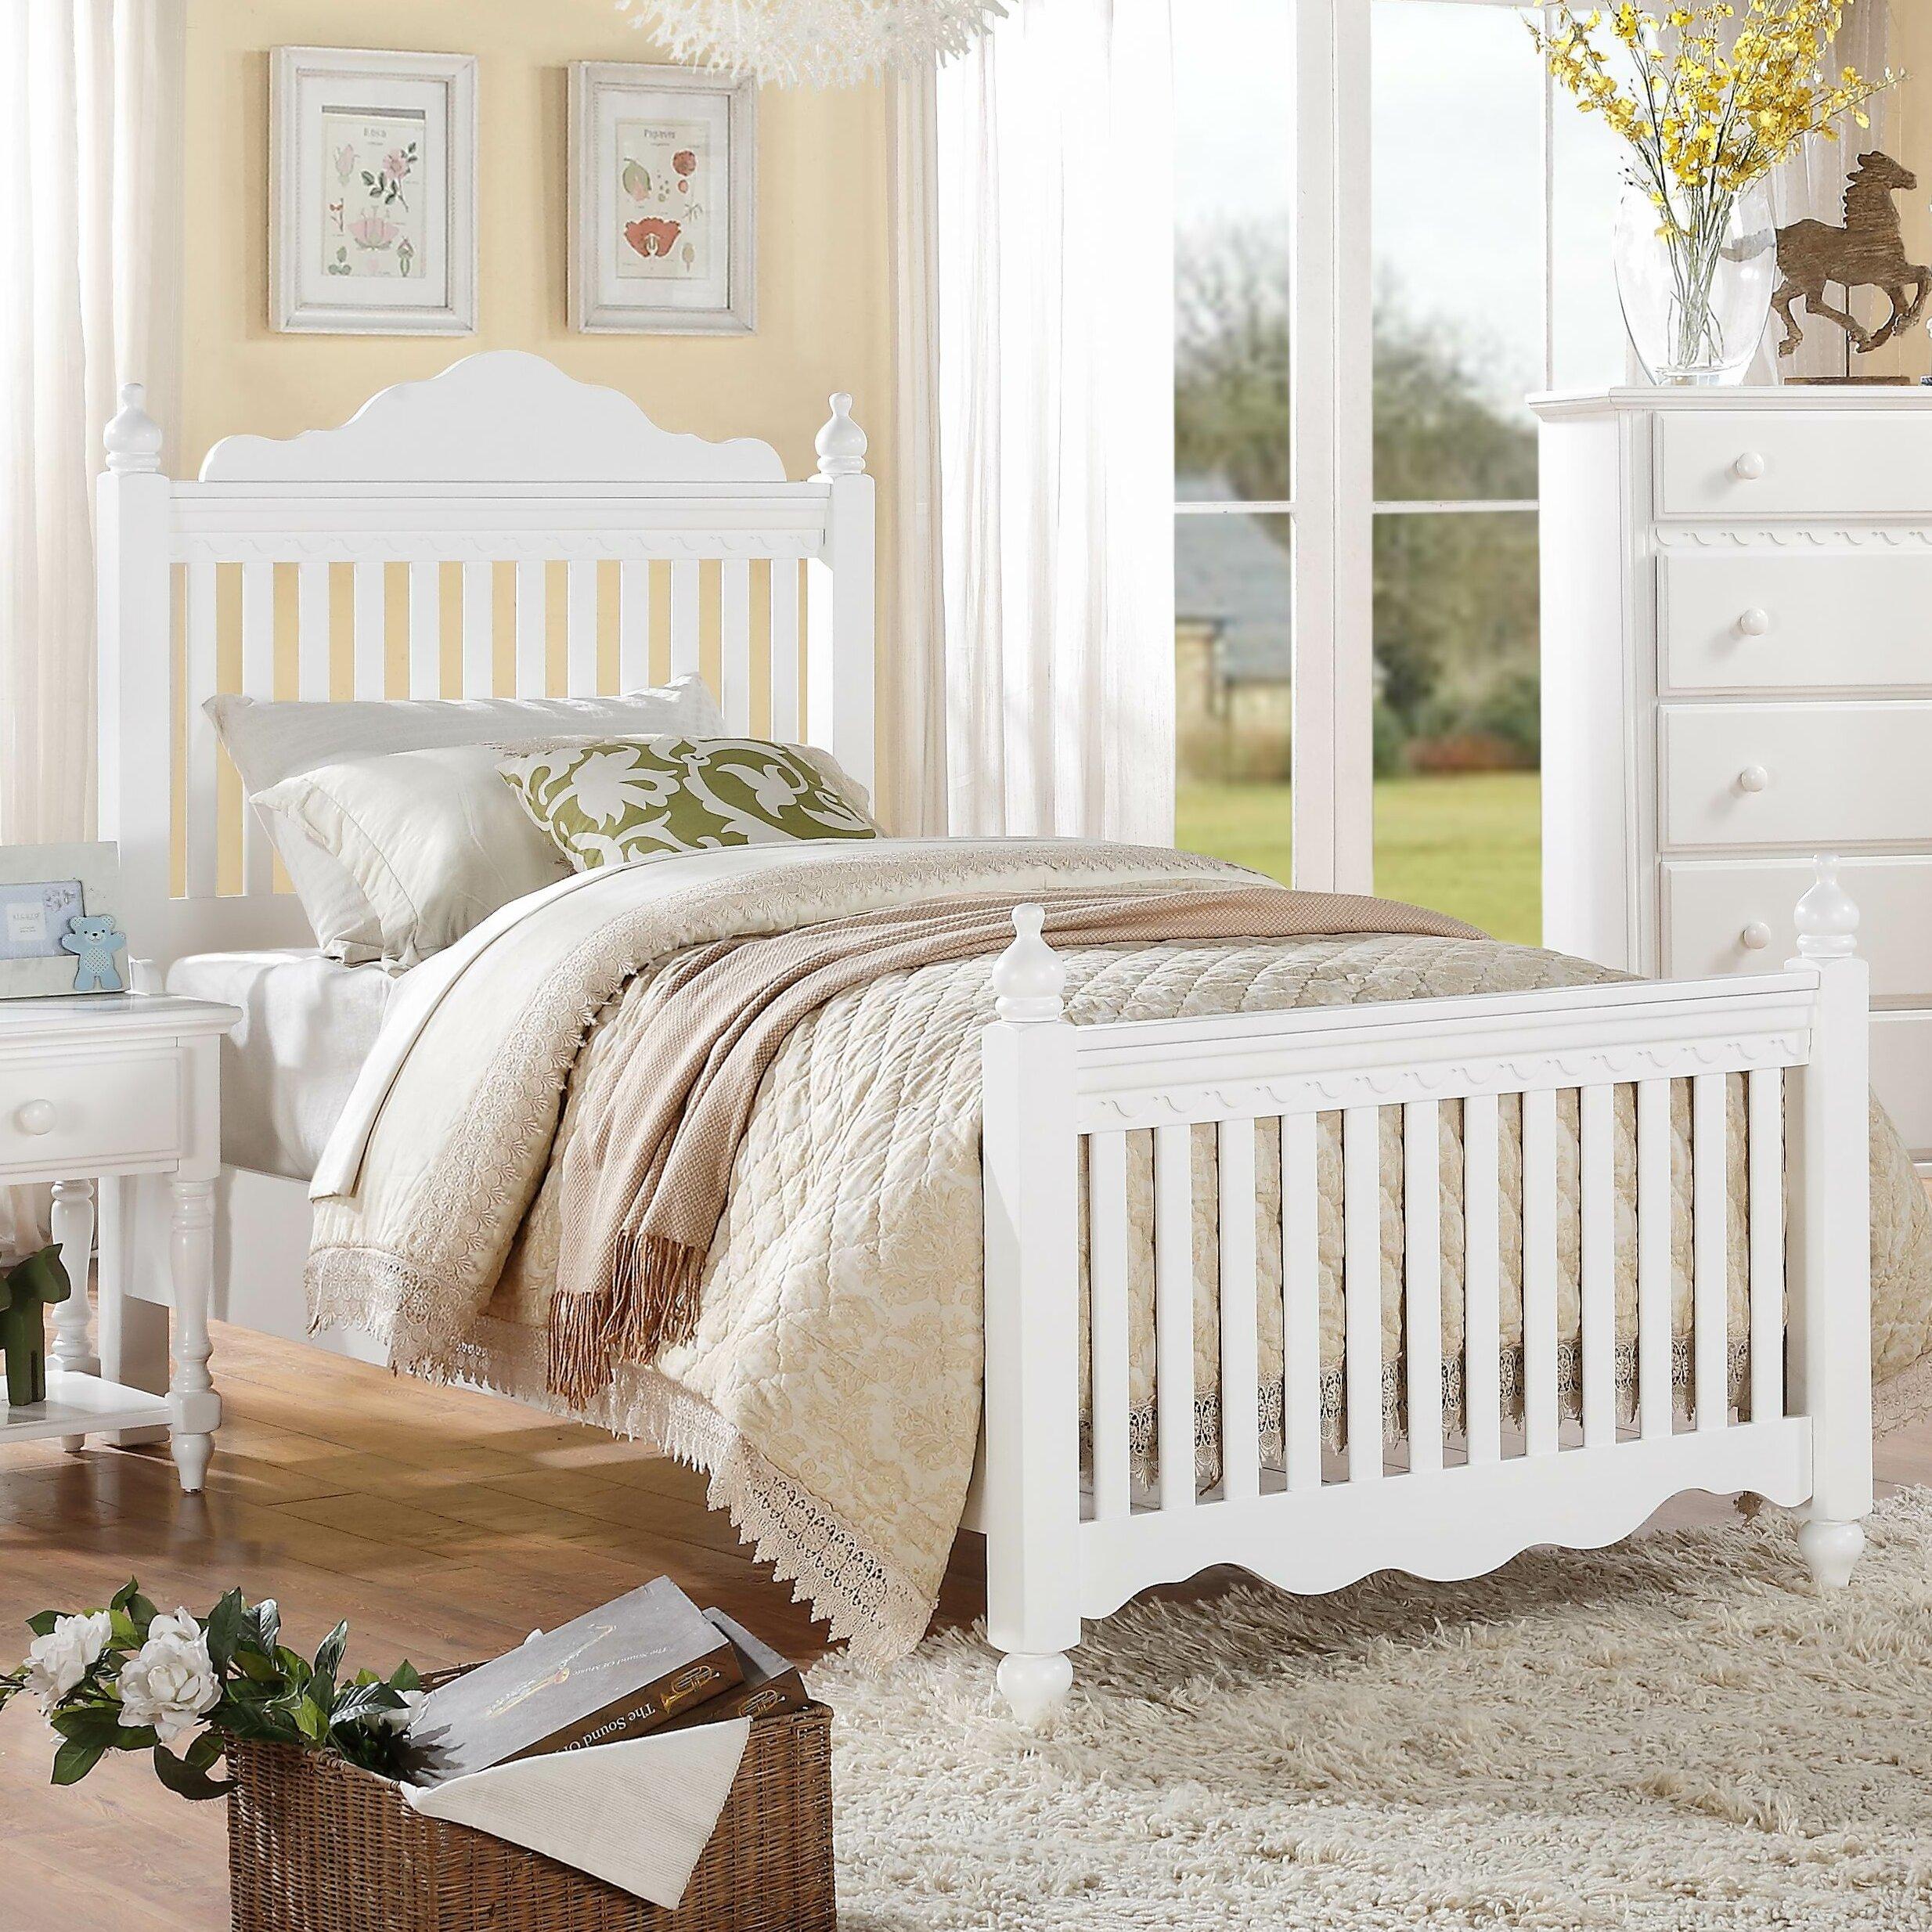 Woodhaven Hill Emmaline Slat Bed Reviews Wayfair